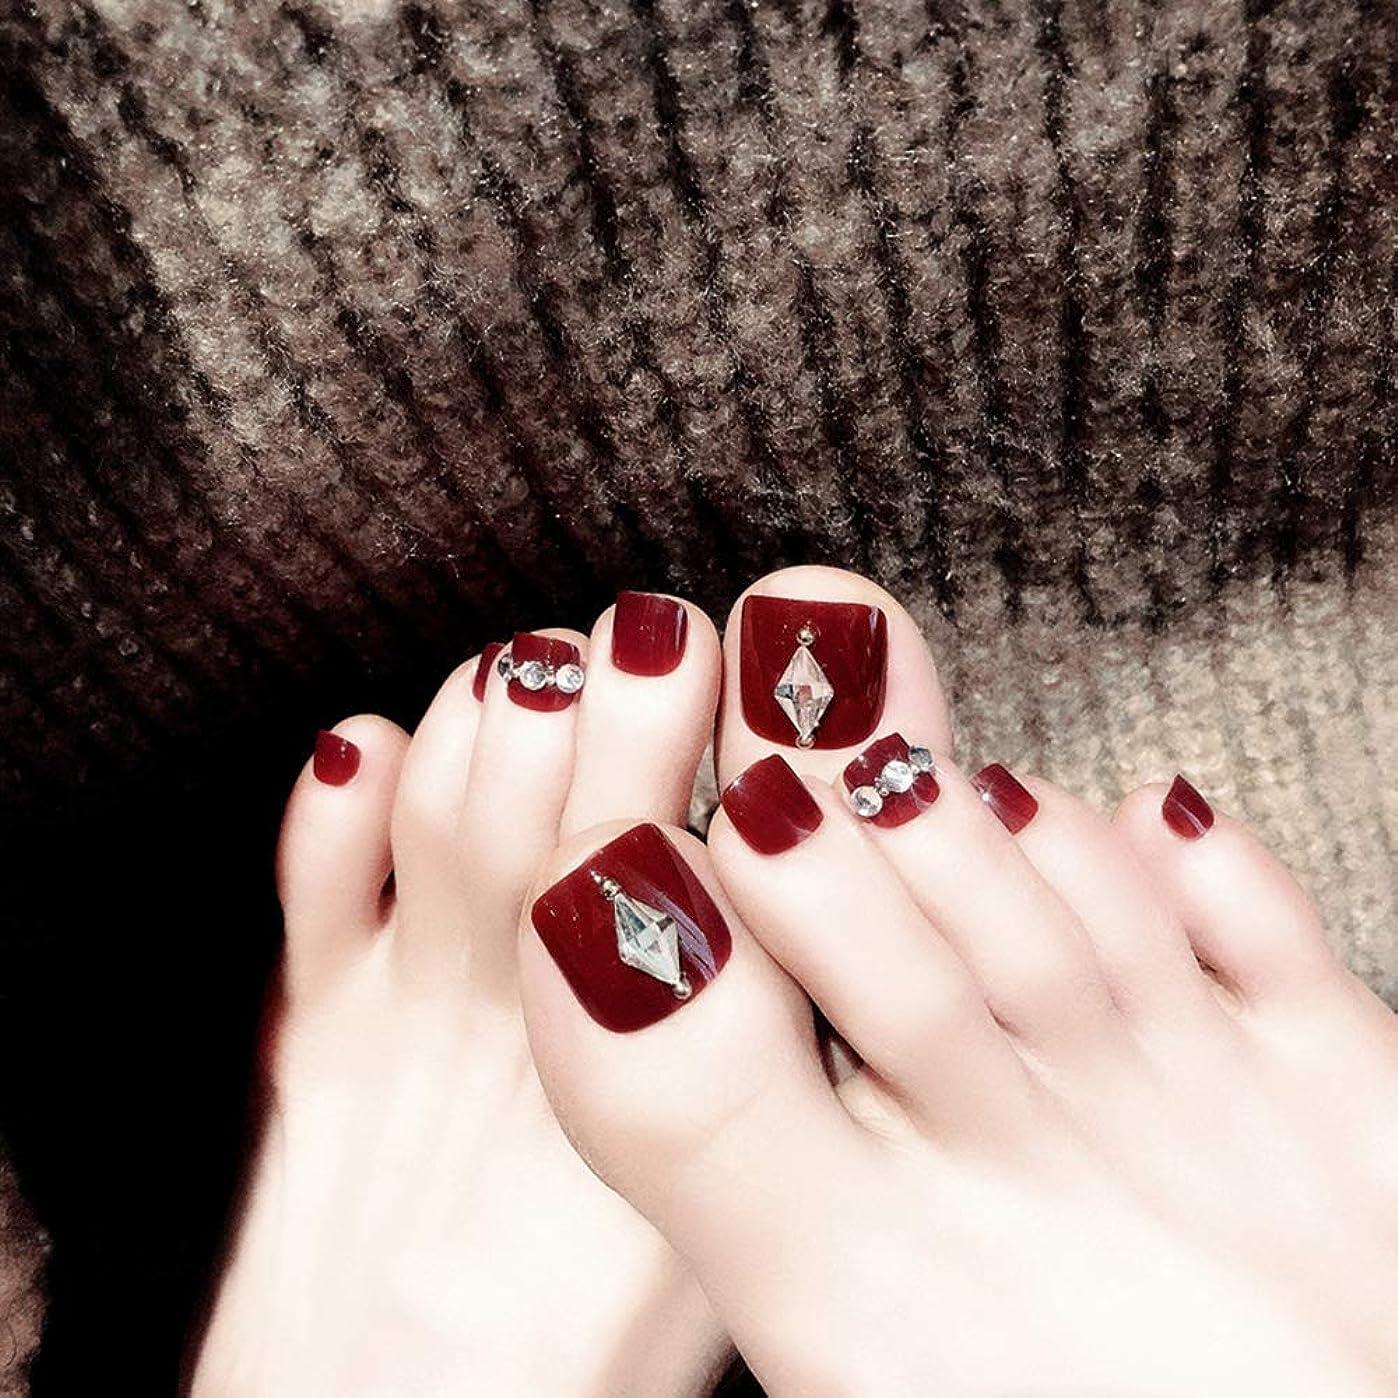 XUTXZKA 24ピース赤ワインつま先偽爪付き人工ダイヤモンドファッションつま先偽爪のための結婚式や毎日のステッカー